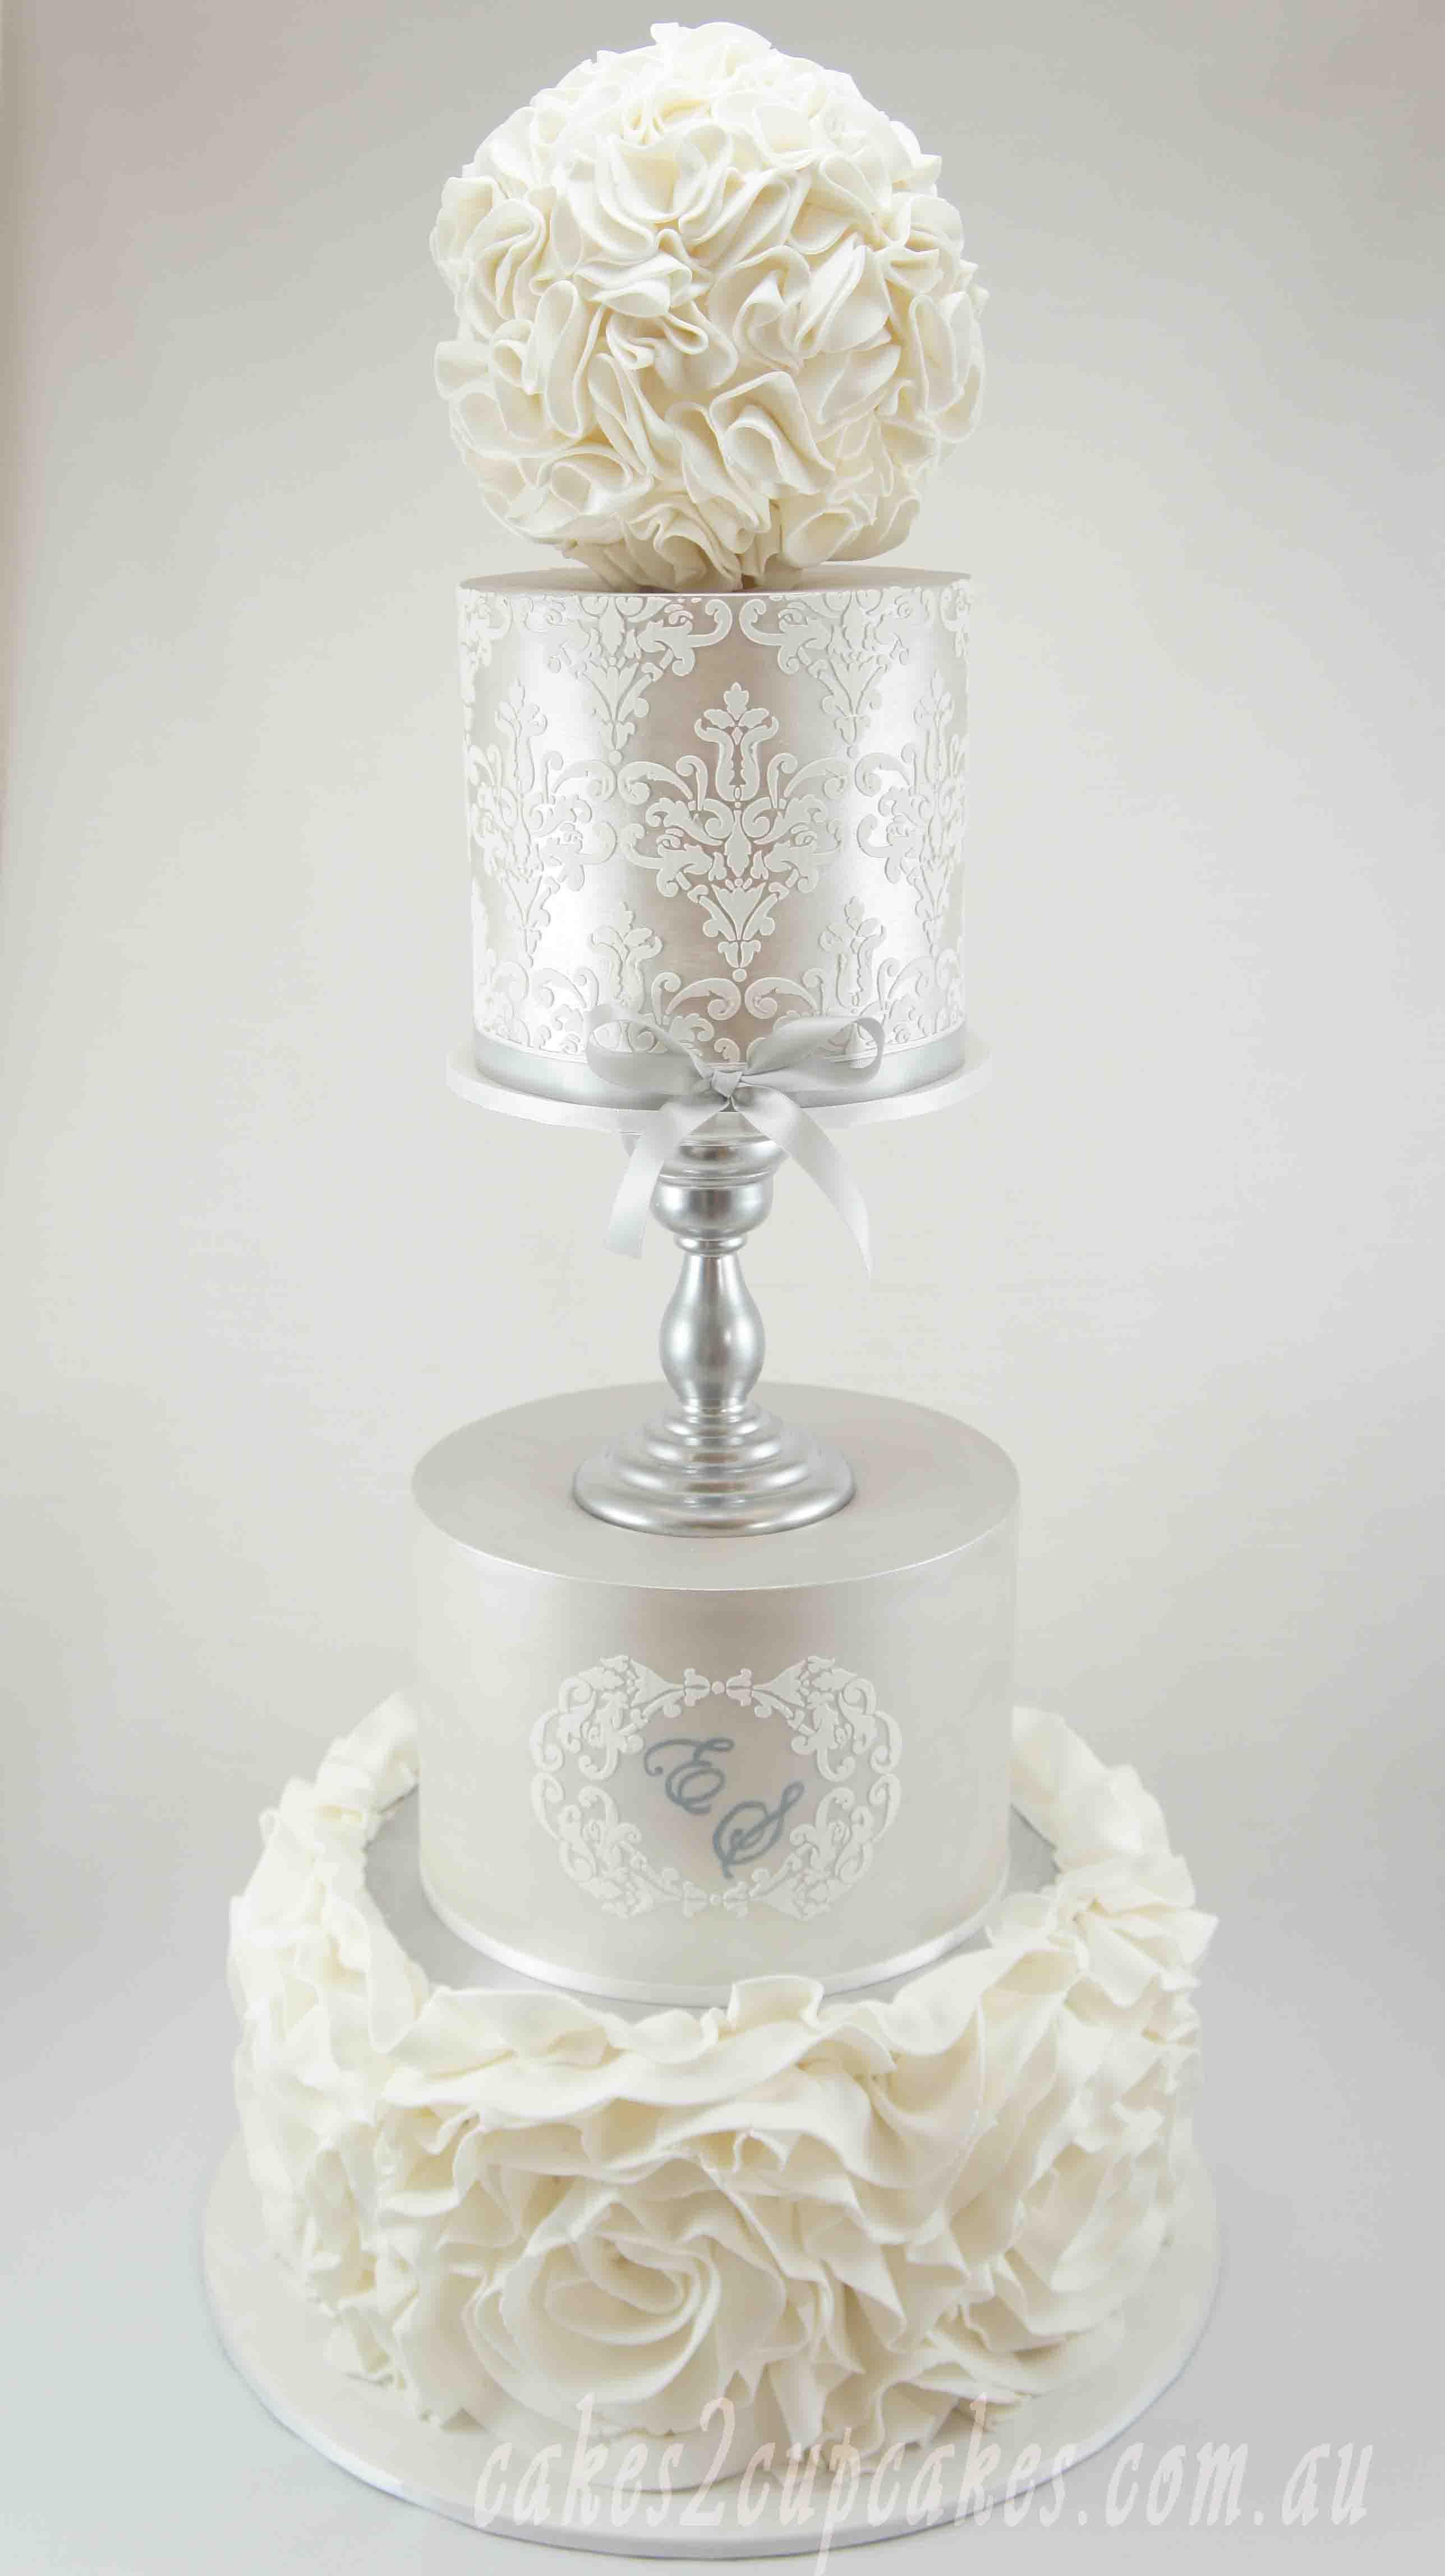 cakes-2-cupcakes-wedding-silver.jpg